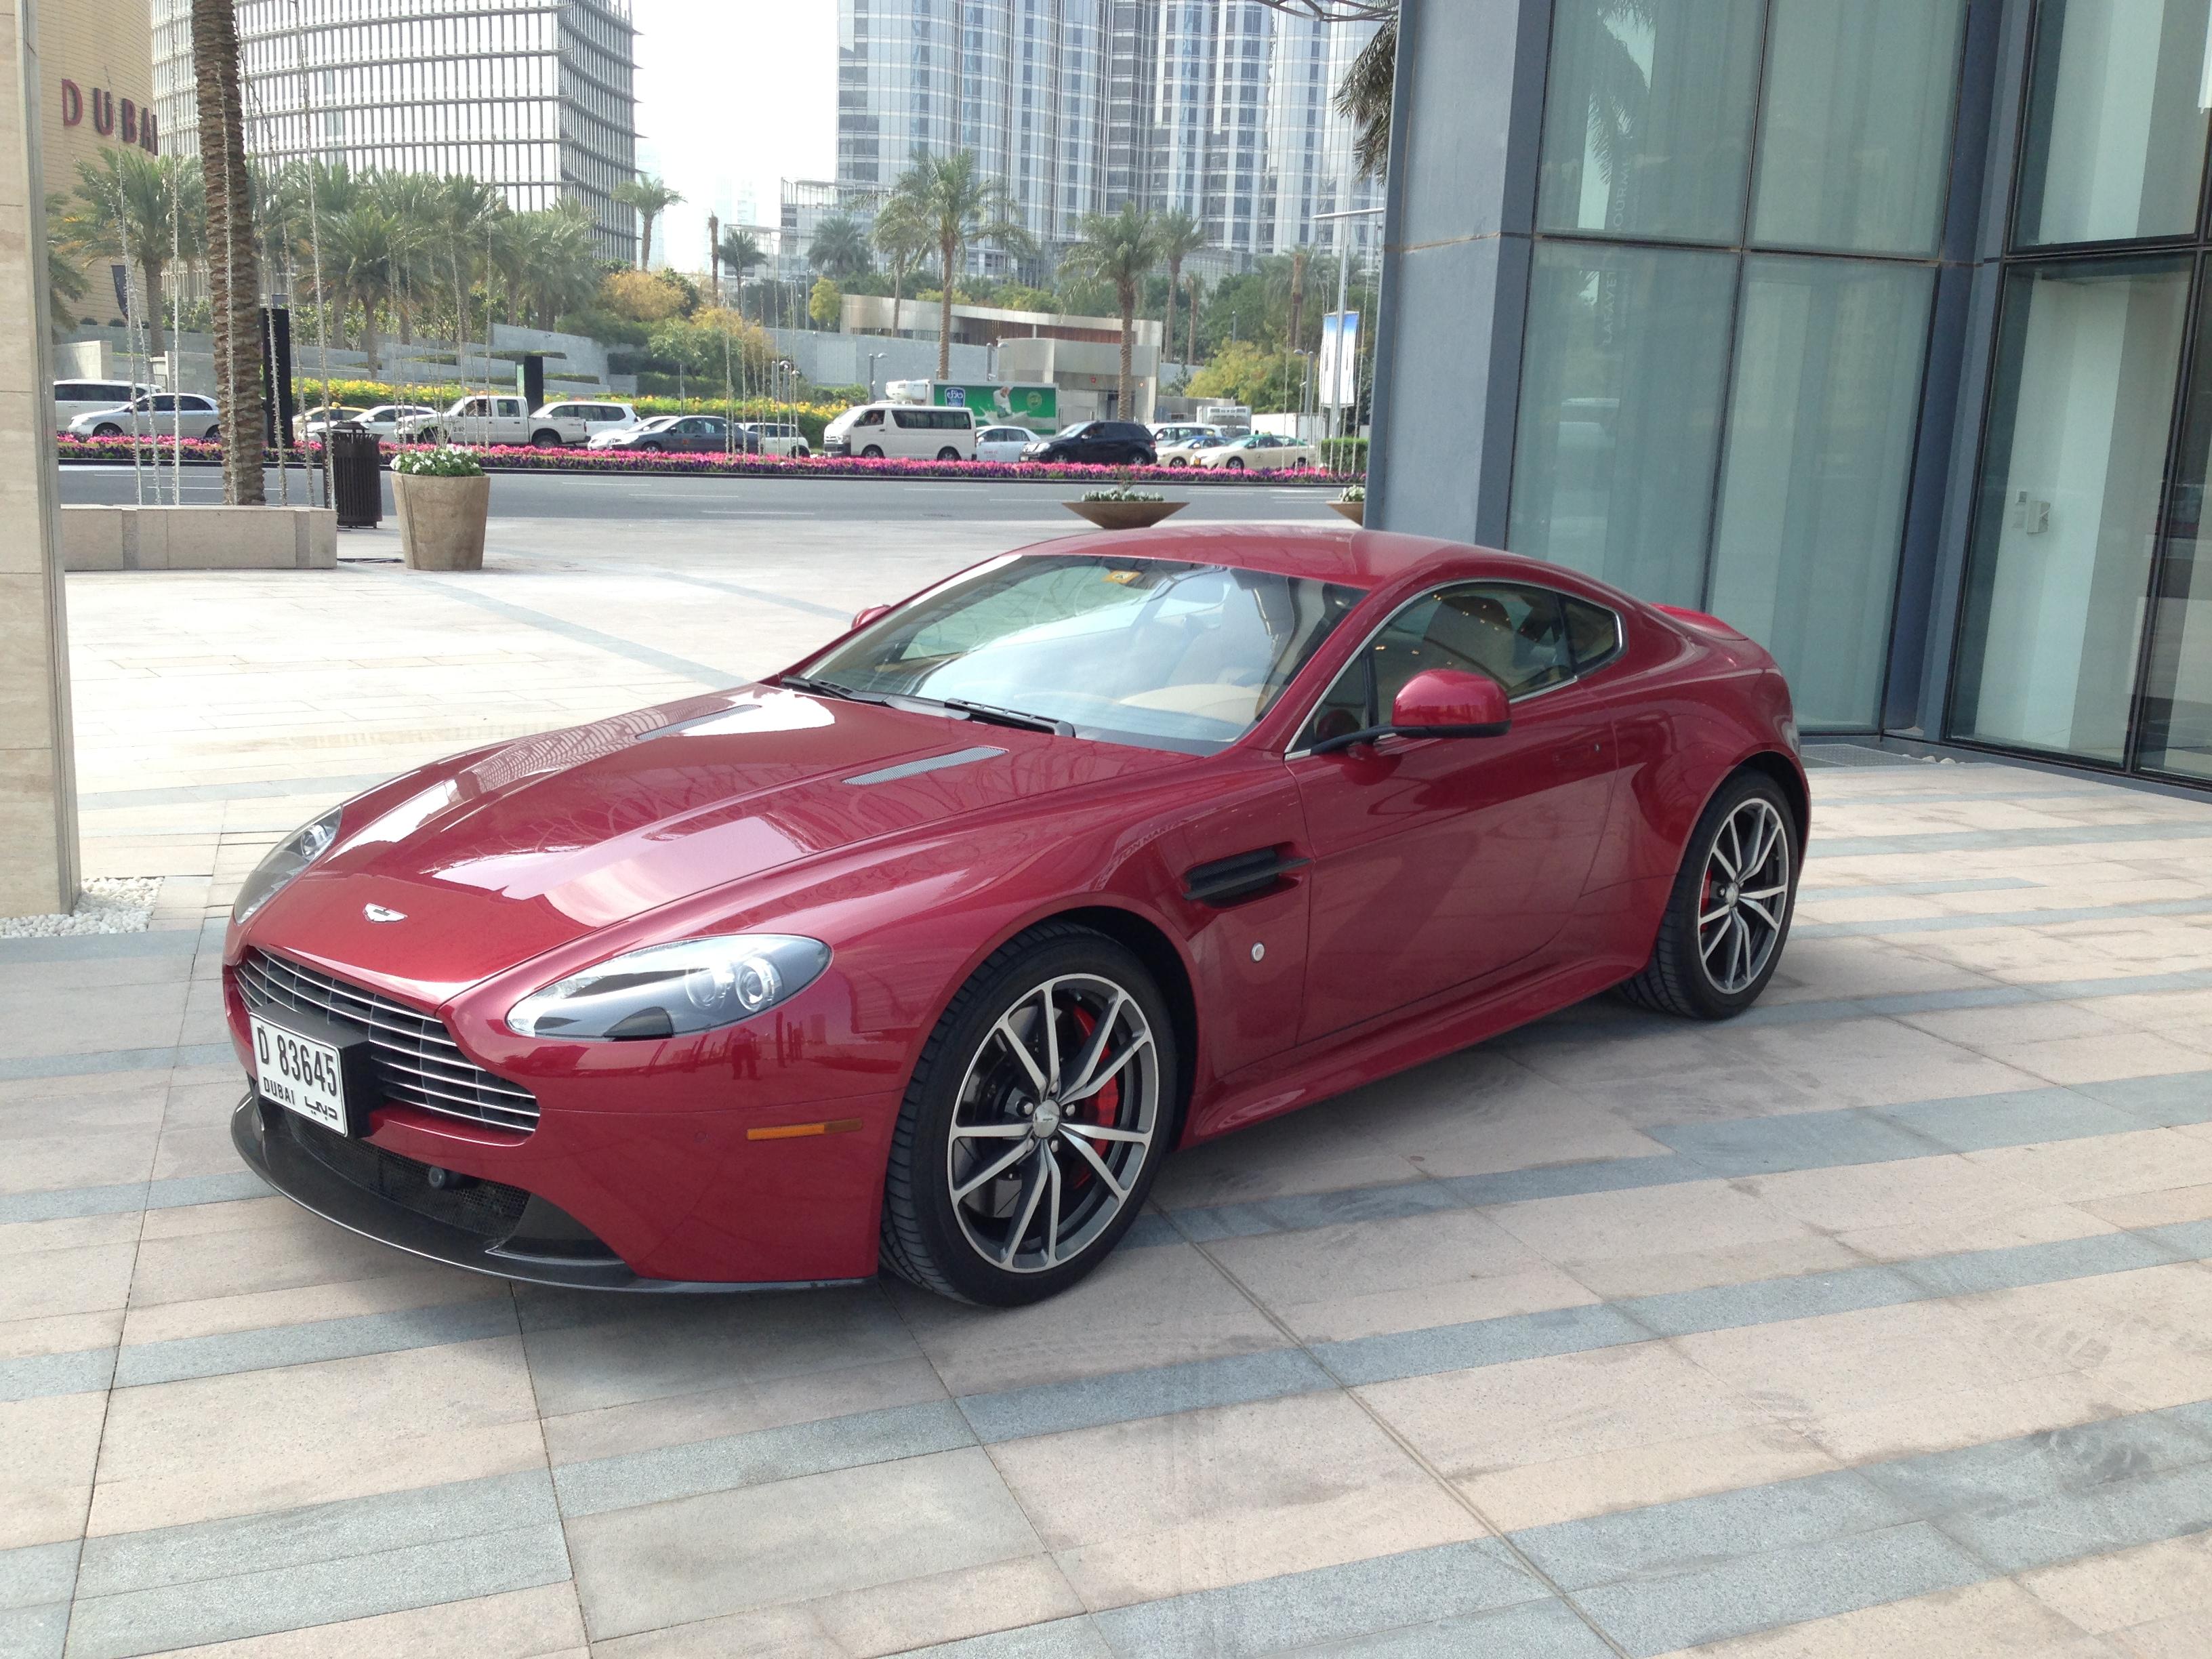 Aston Martin V8 Vantage on Aston Martin Engine Scheme